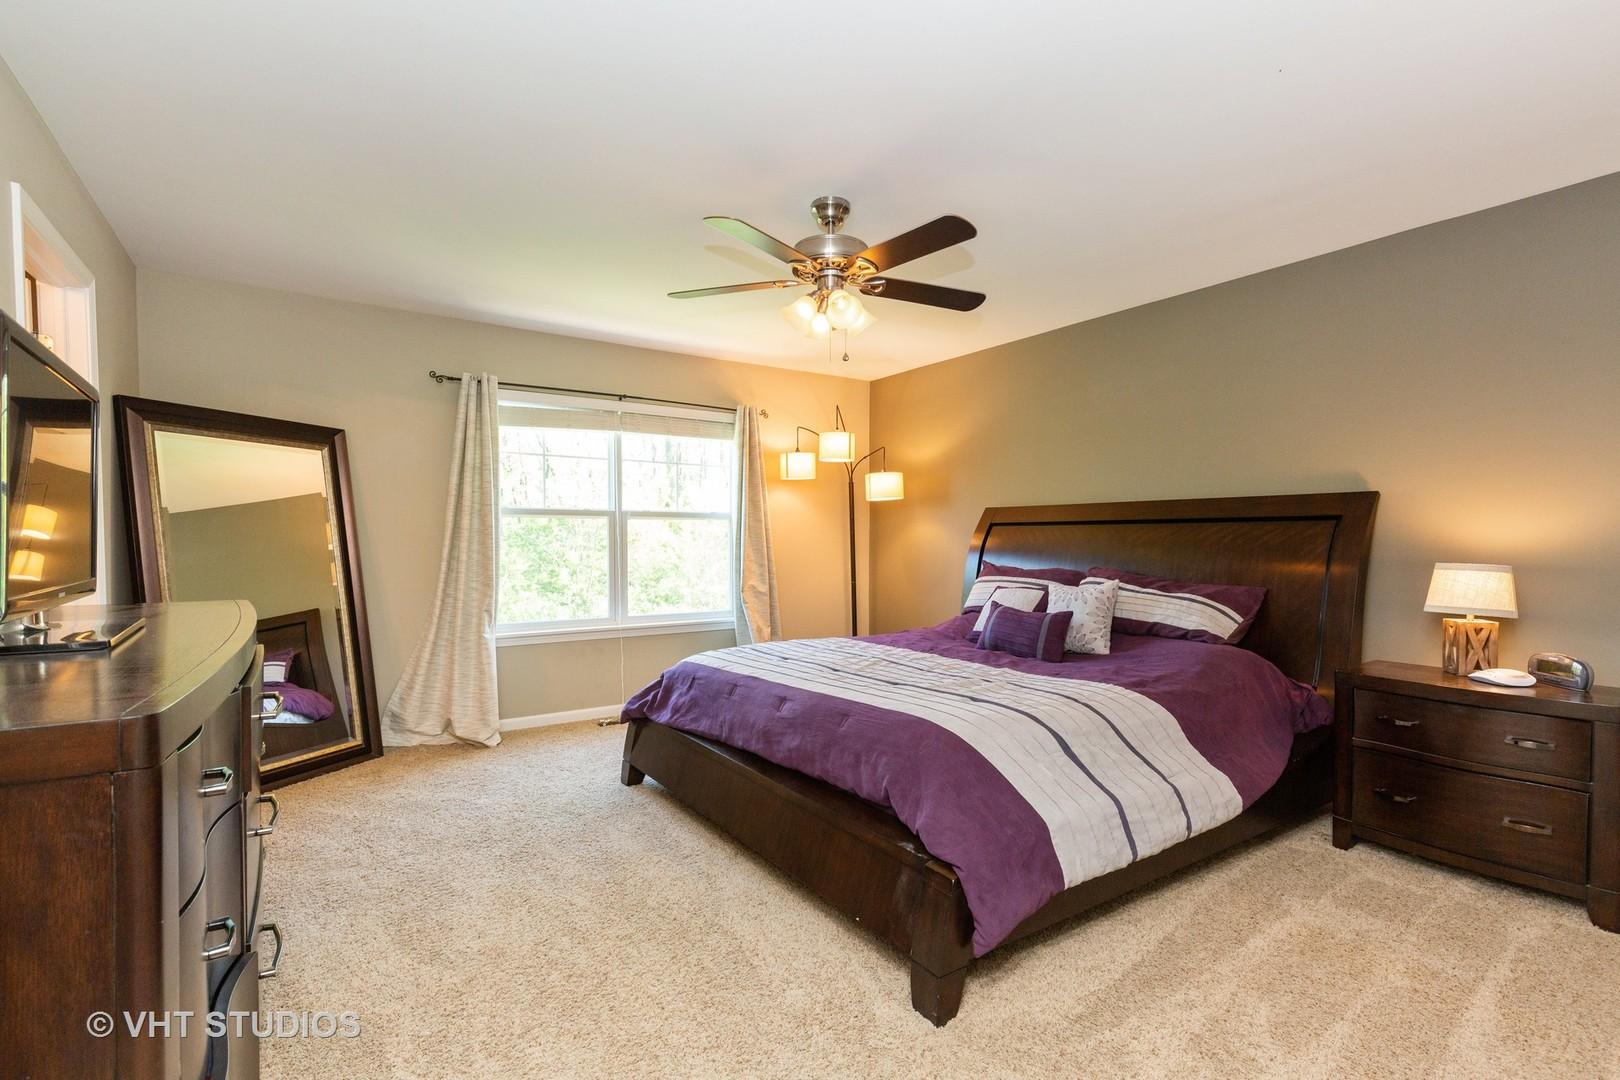 2708 Regency, ST. CHARLES, Illinois, 60175